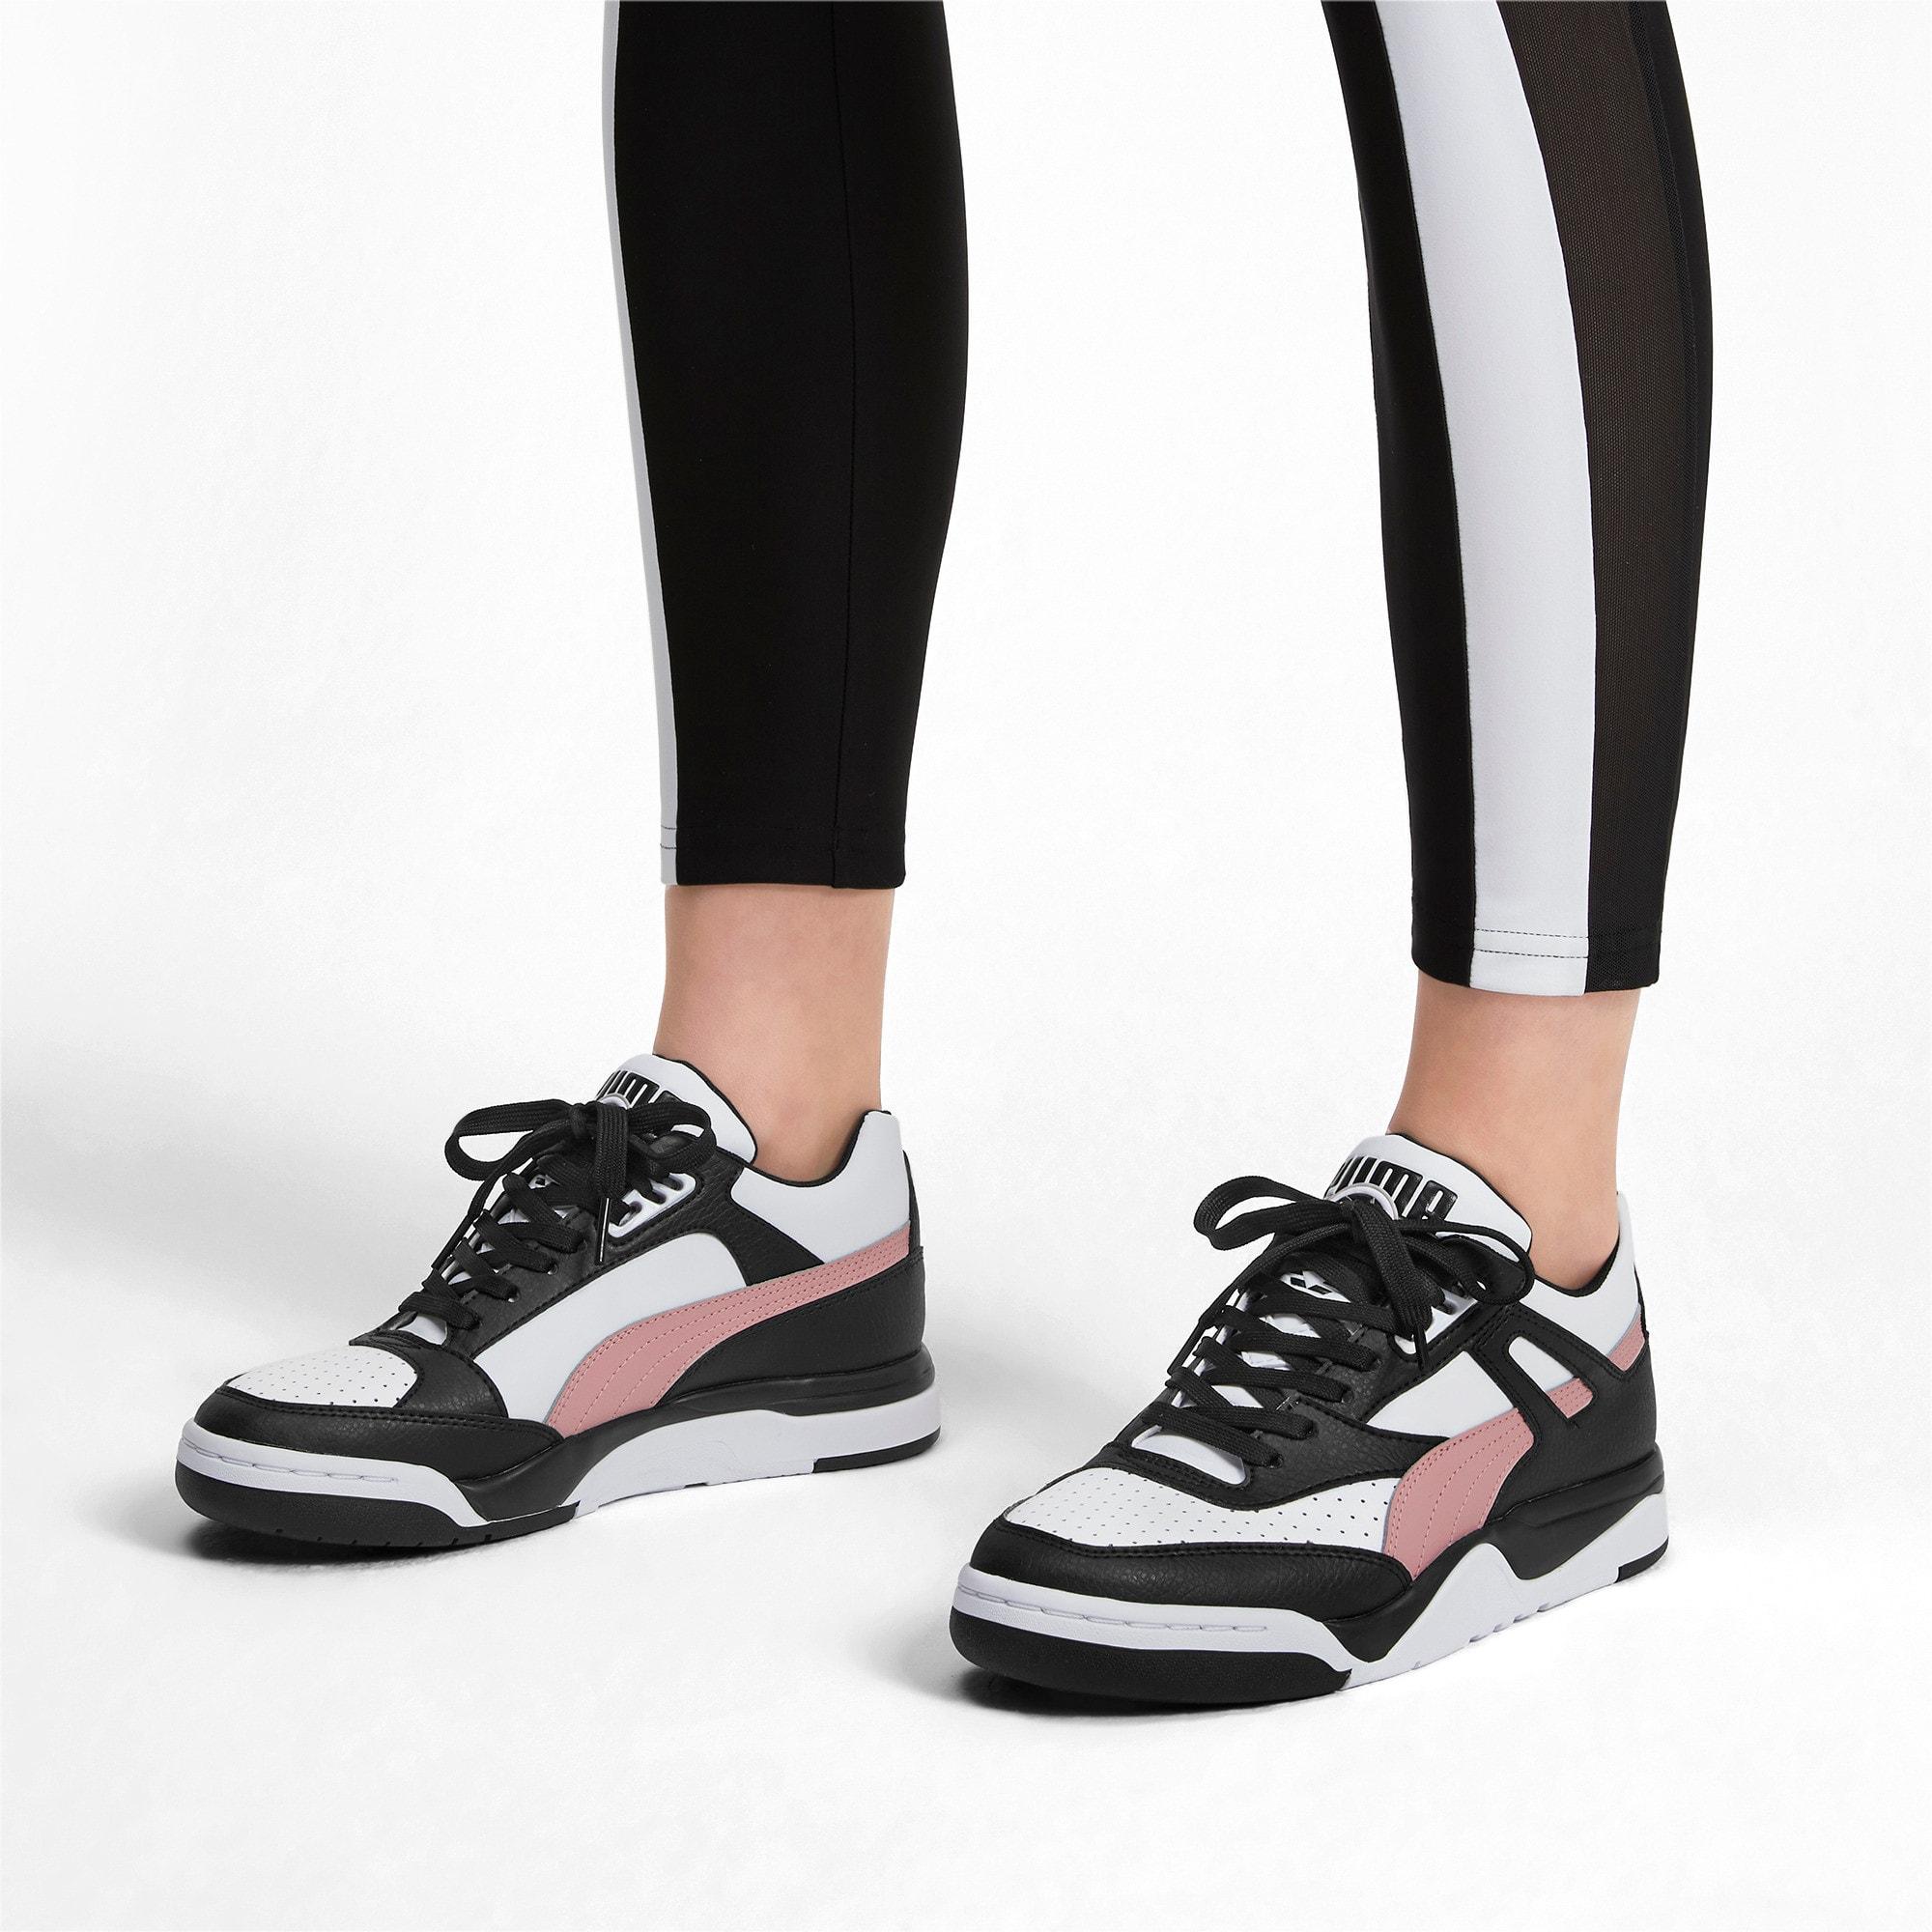 Thumbnail 2 of Palace Guard Colorblock Women's Sneakers, Puma Black-Puma White, medium